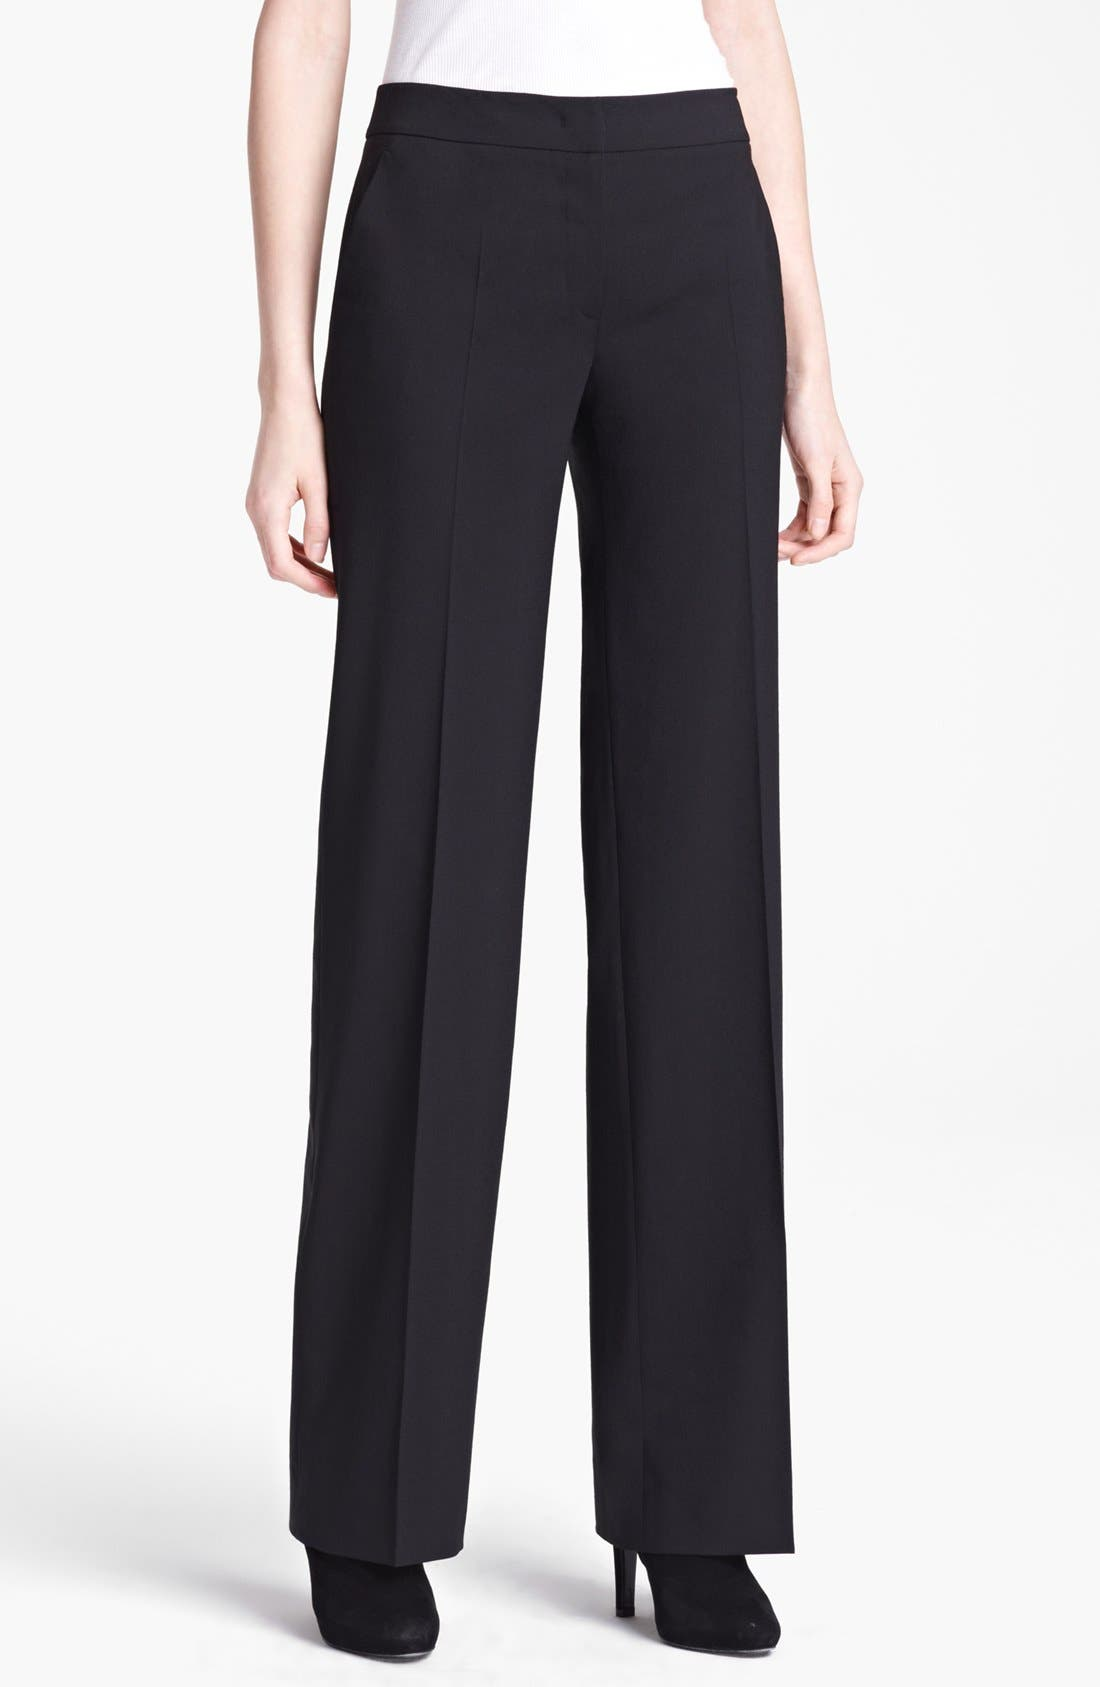 Alternate Image 1 Selected - Armani Collezioni Narrow Leg Stretch Wool Pants